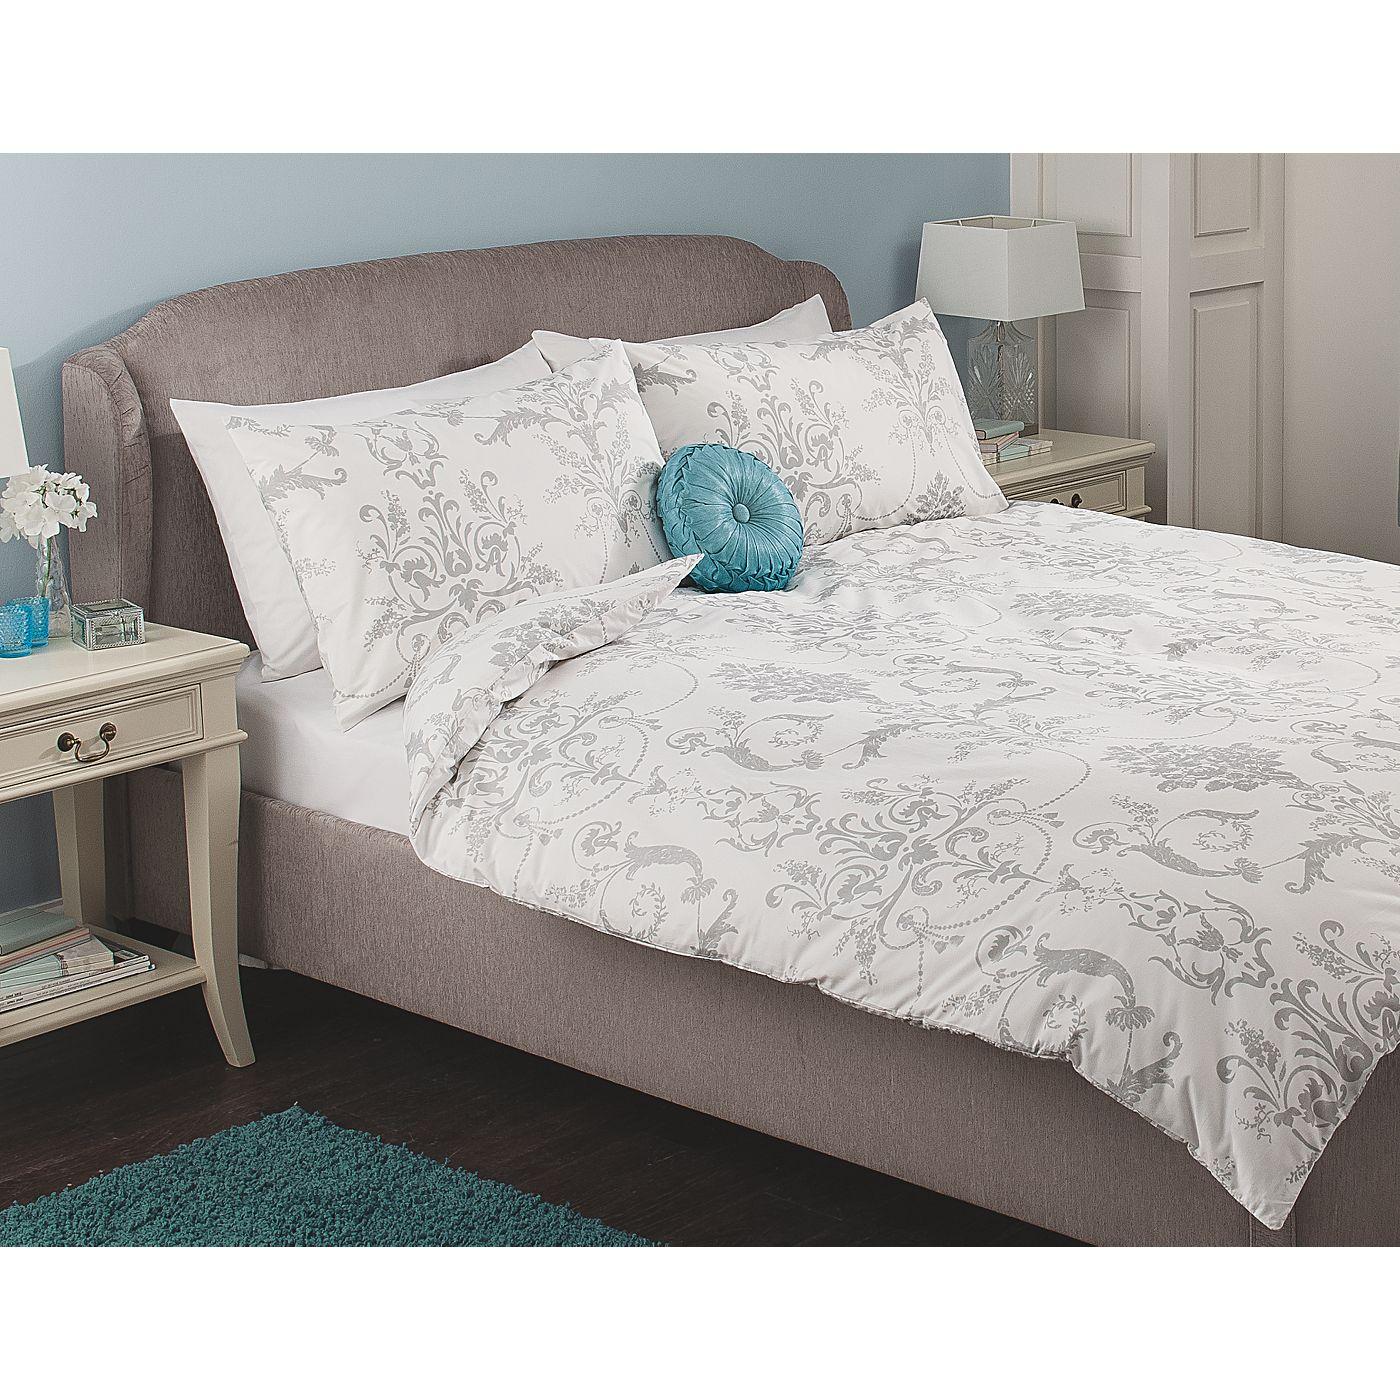 George Home Delicate Damask White Duvet Range Bedding Asda Direct